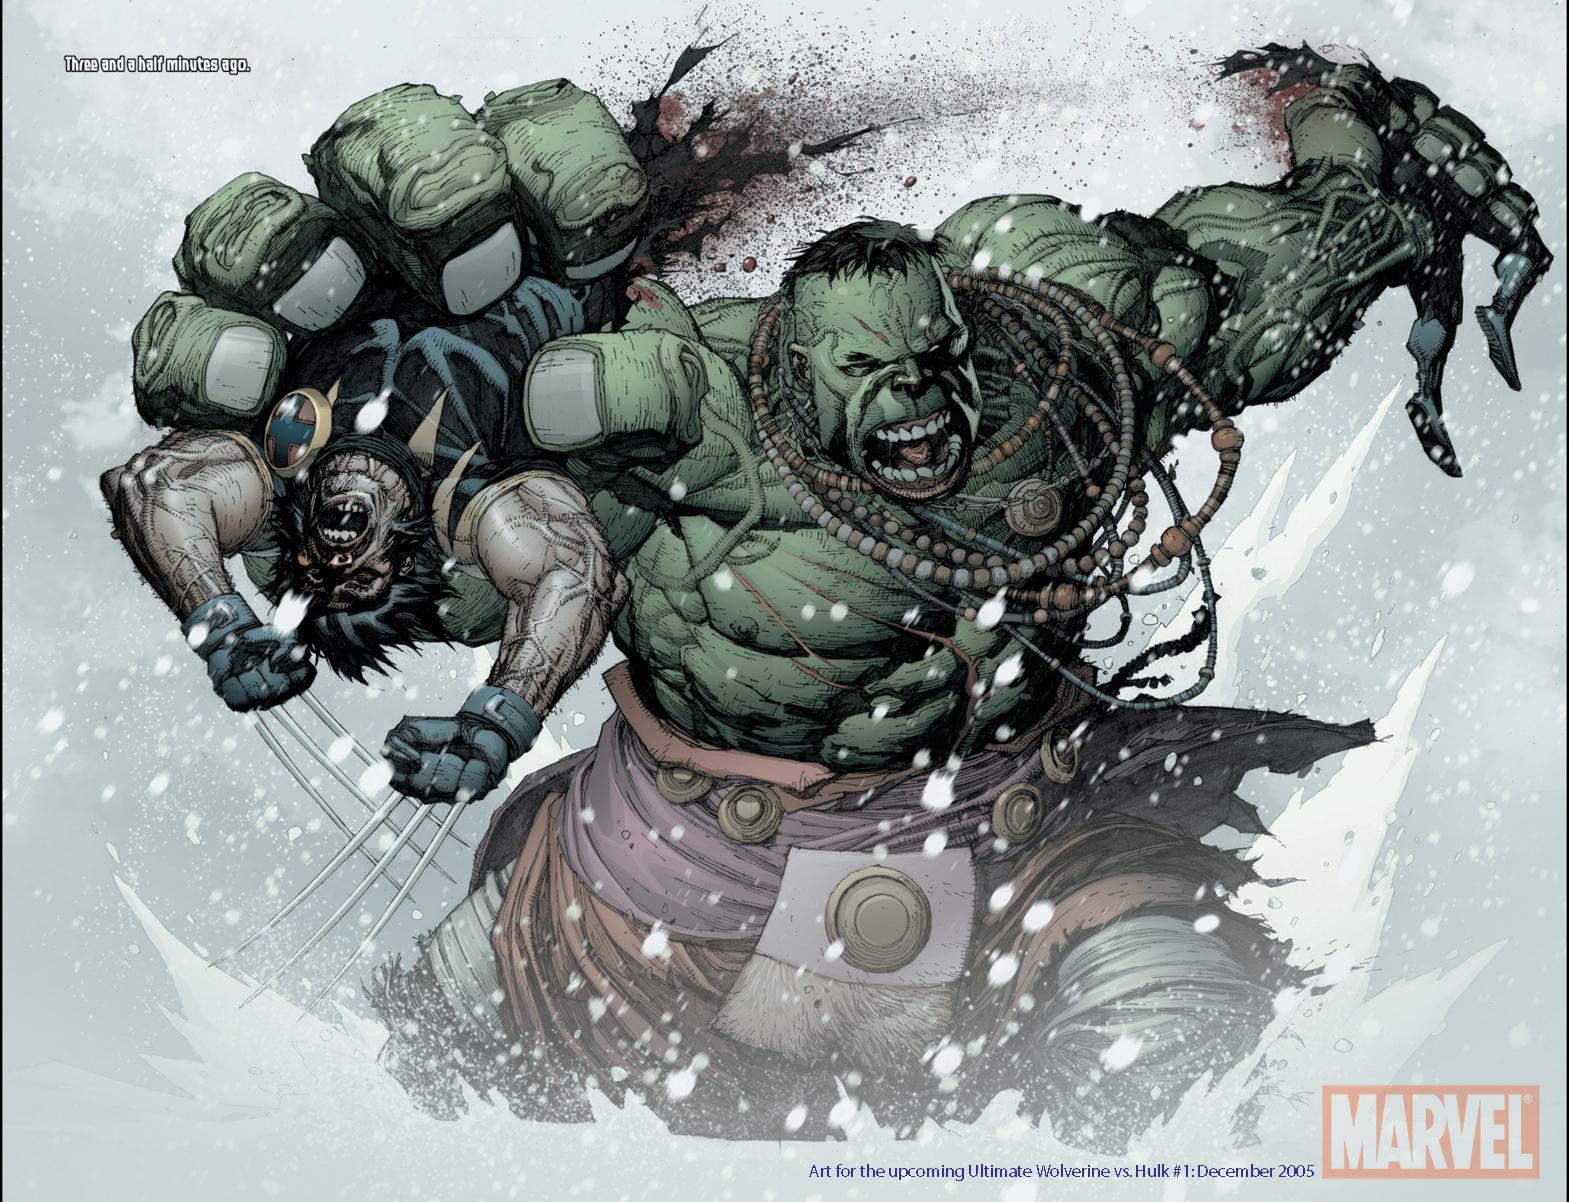 ULTIMATE WOLVERINE vs HULK Ultimate-wolverine-vs-hulk